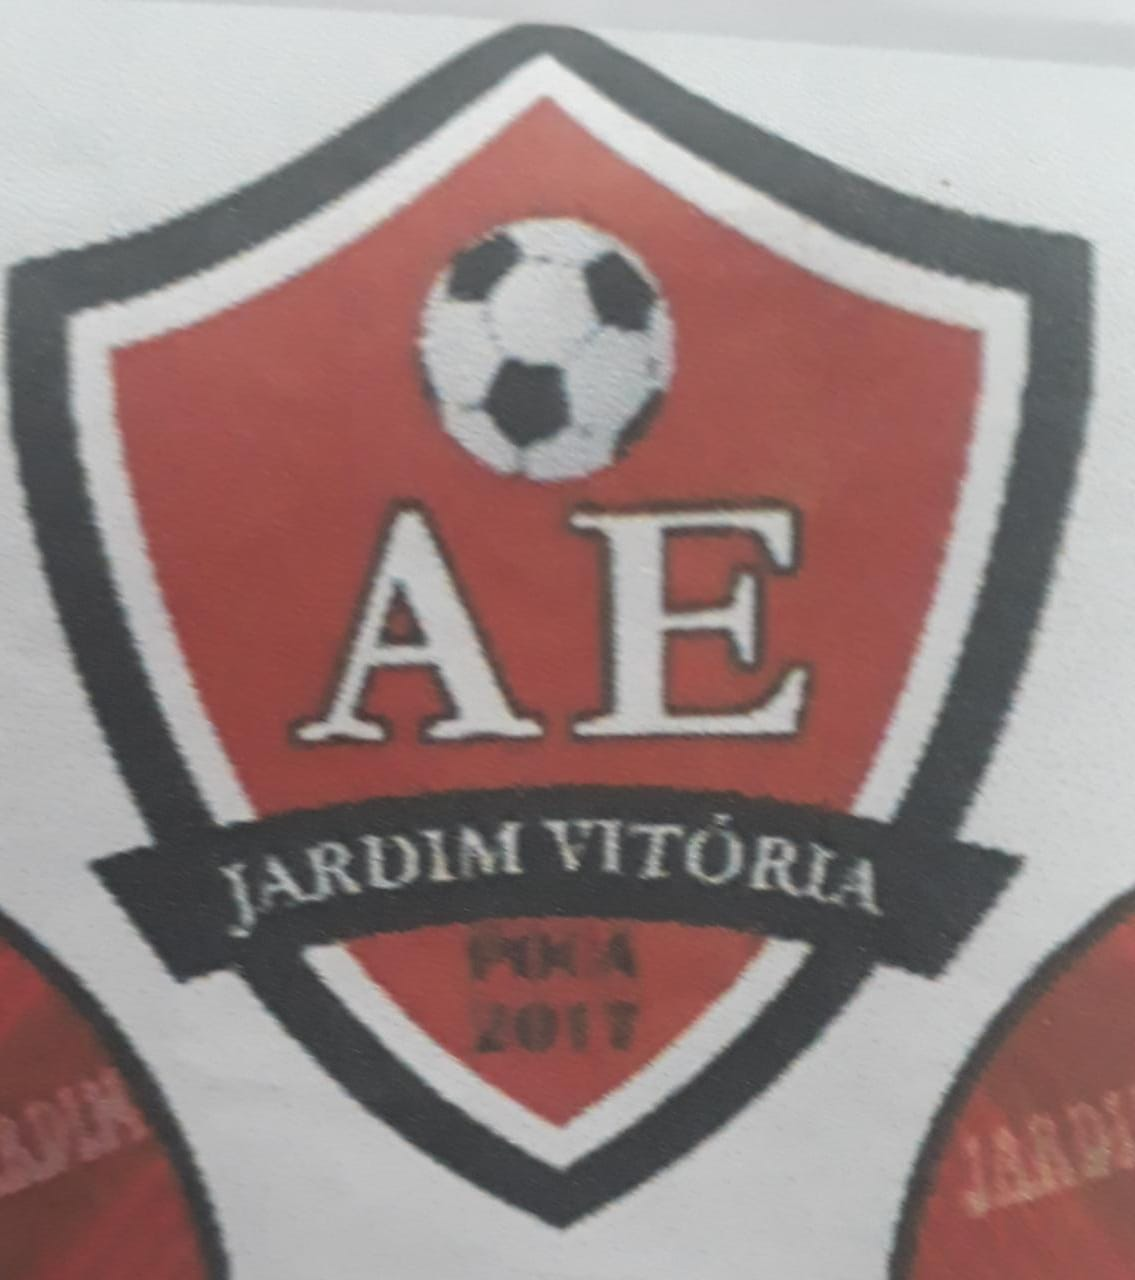 A.E. JARDIM VITORIA